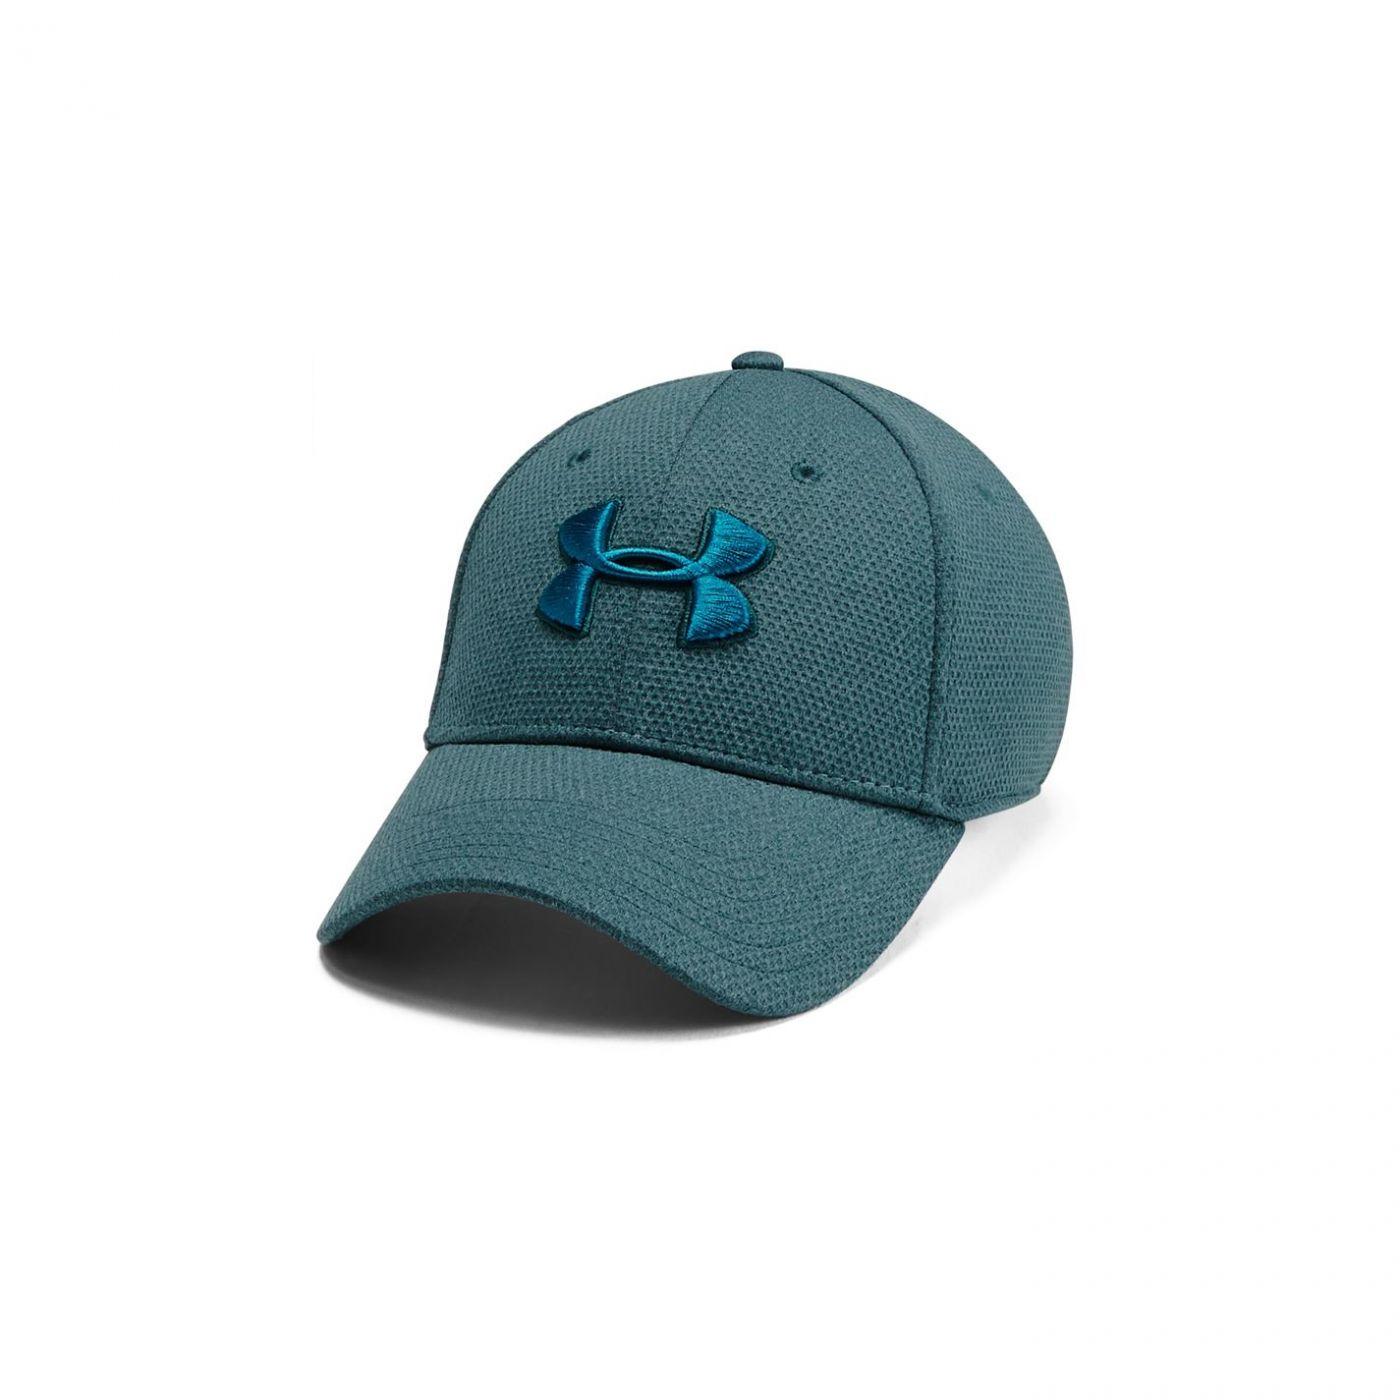 Men's cap Under Armour Heather Blitzing